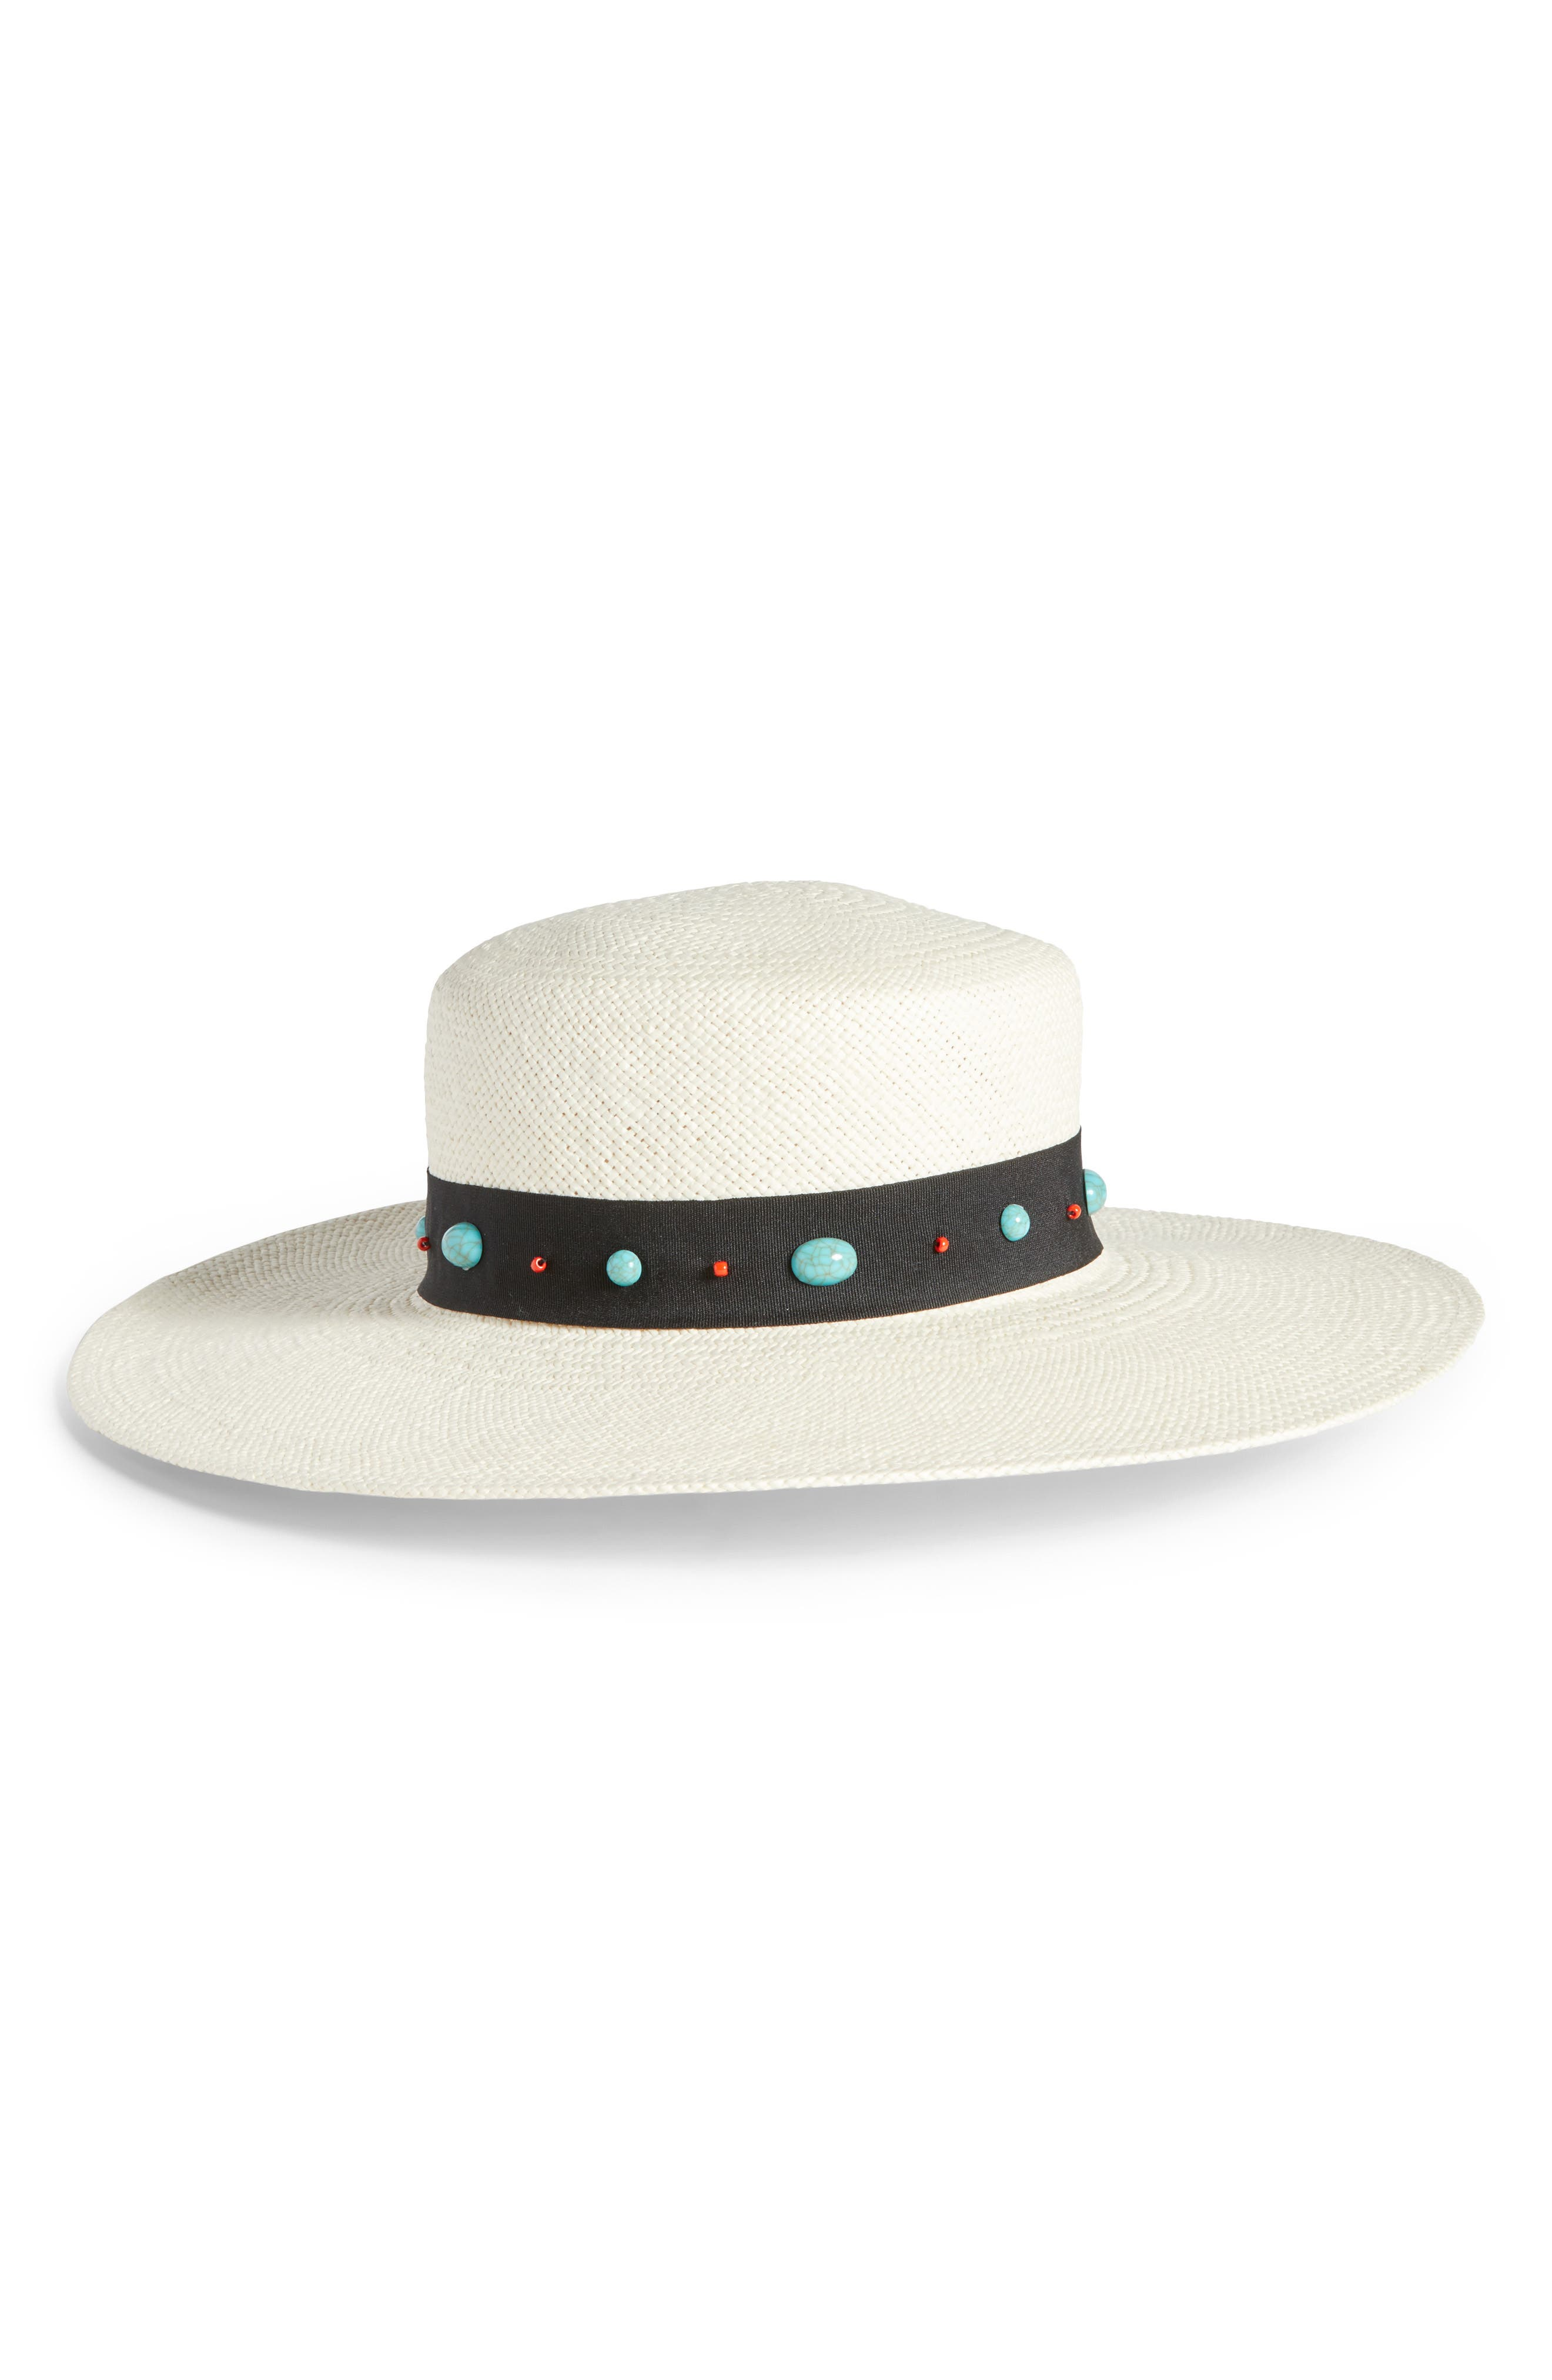 TREASURE & BOND Western Straw Boater Hat, Main, color, 900